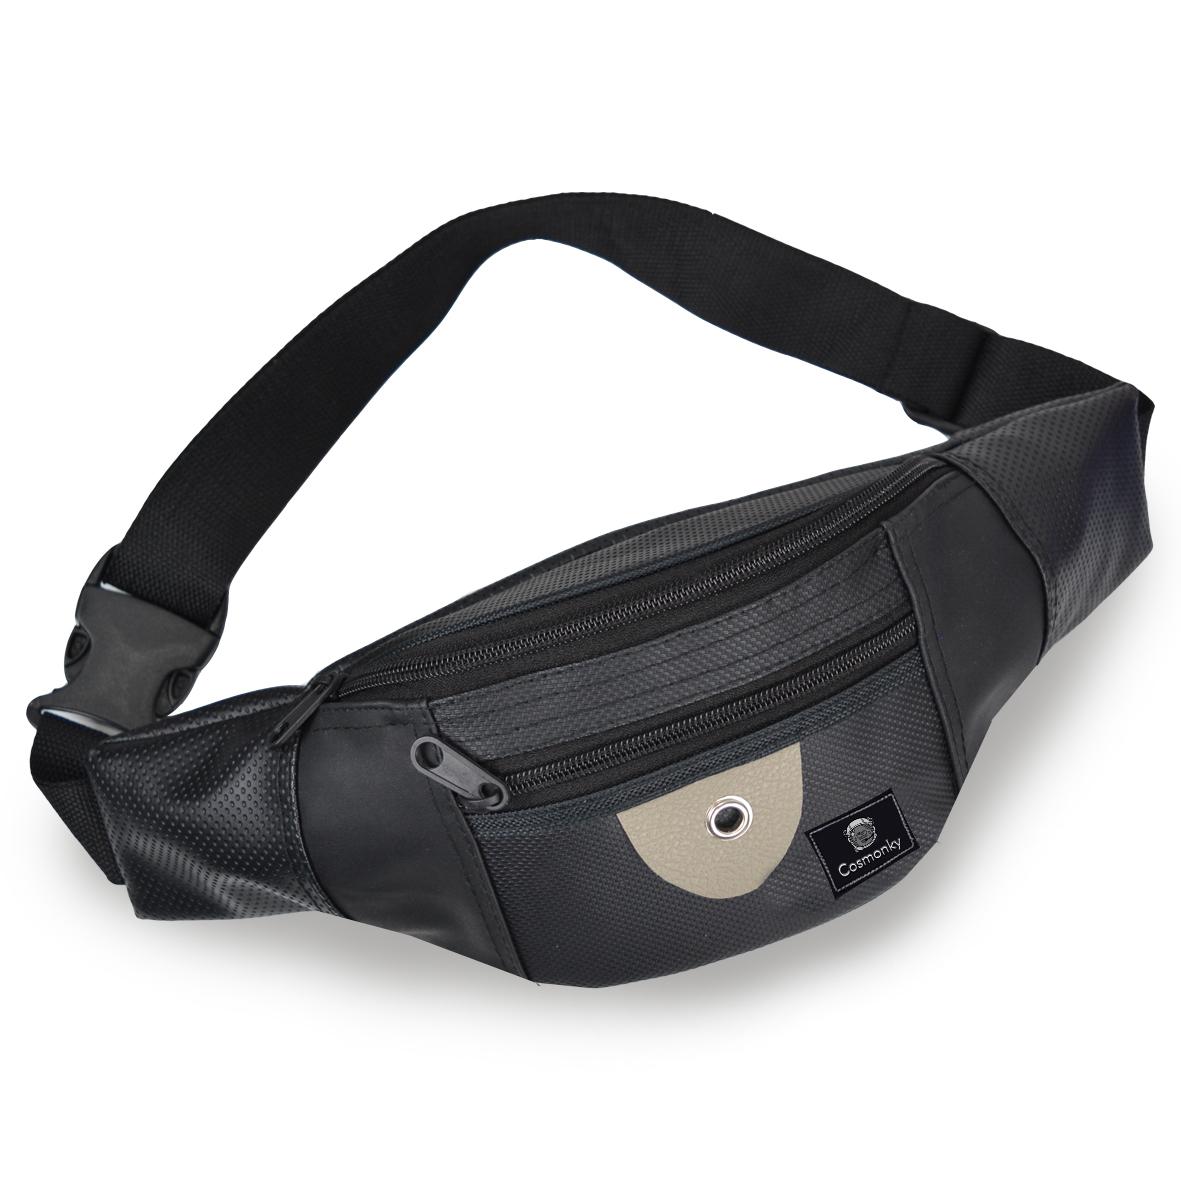 promo tas pinggang waistbag cosmonky lester/tas kulit / crossbody bags / tas selempang casual / tas organizer / tas /cosmonky